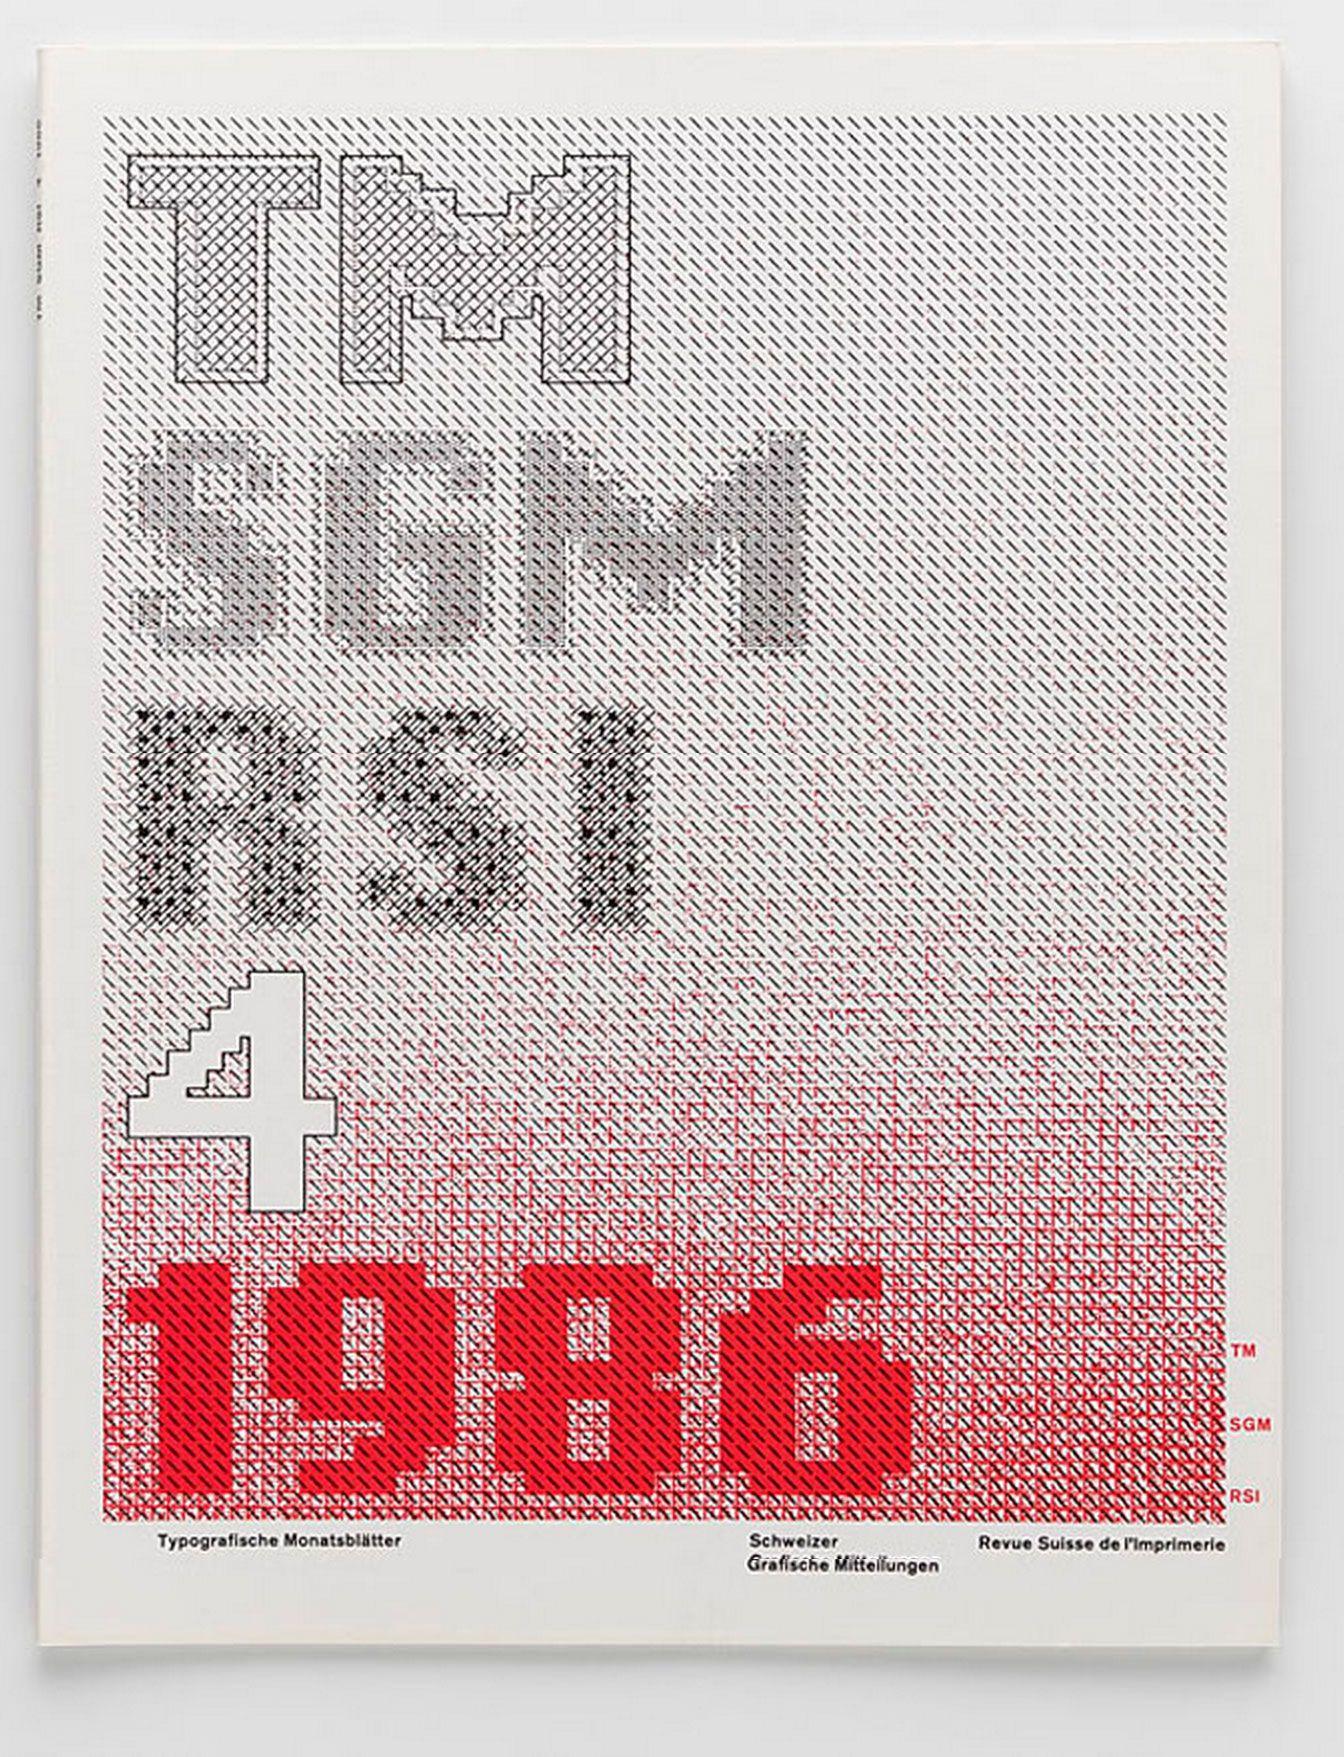 Swiss Print Review magazine, 1986 design by Wolfgang Weingart